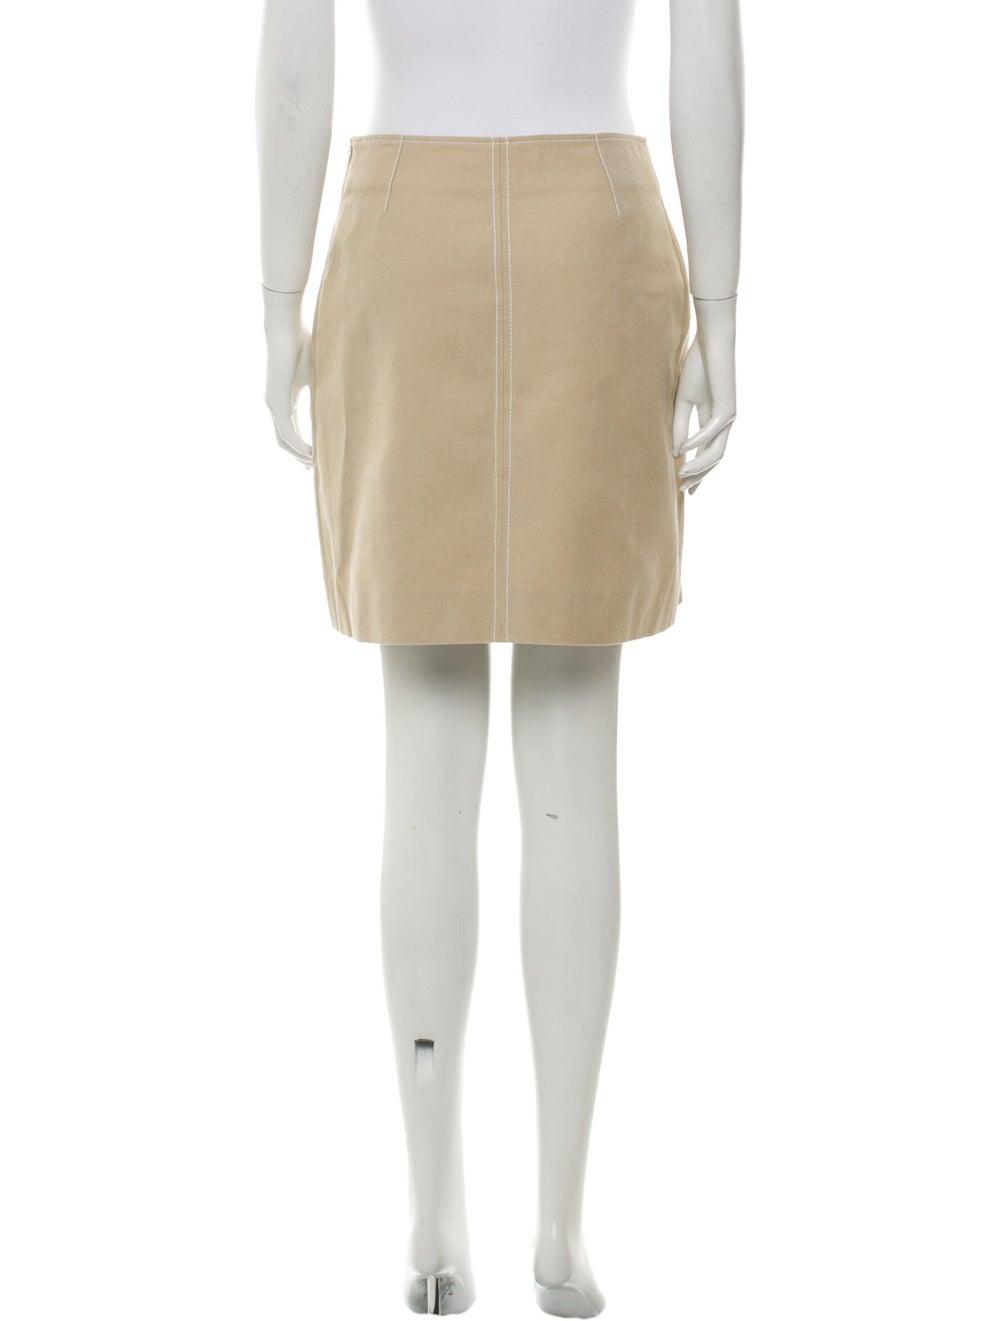 Acne Studios Mini Skirt - image 3